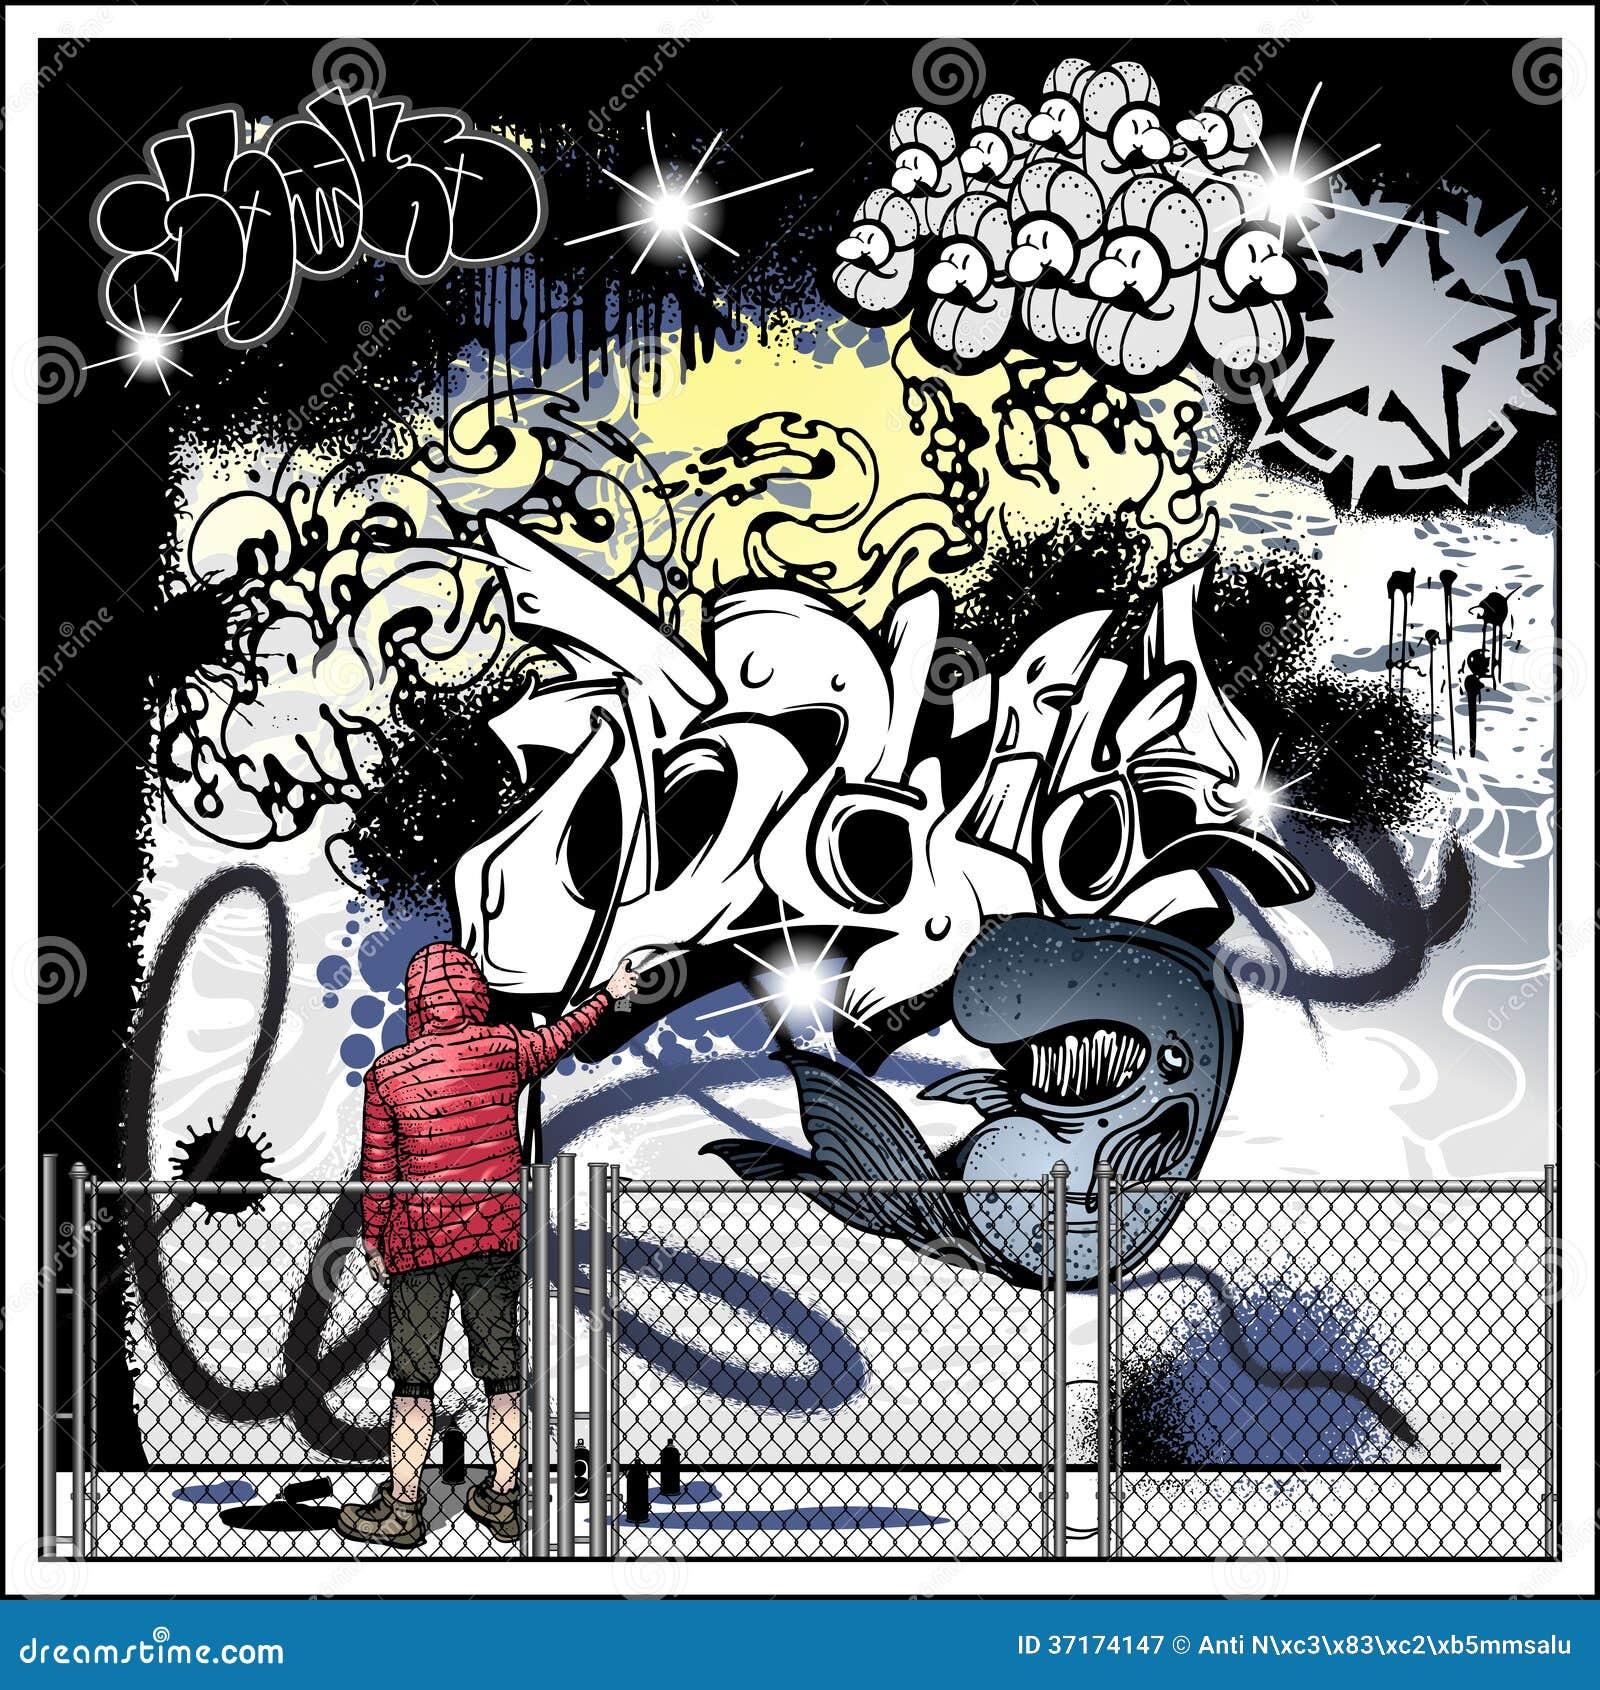 Graffiti wall vector free - Art Artist Graffiti Street Vector Wall